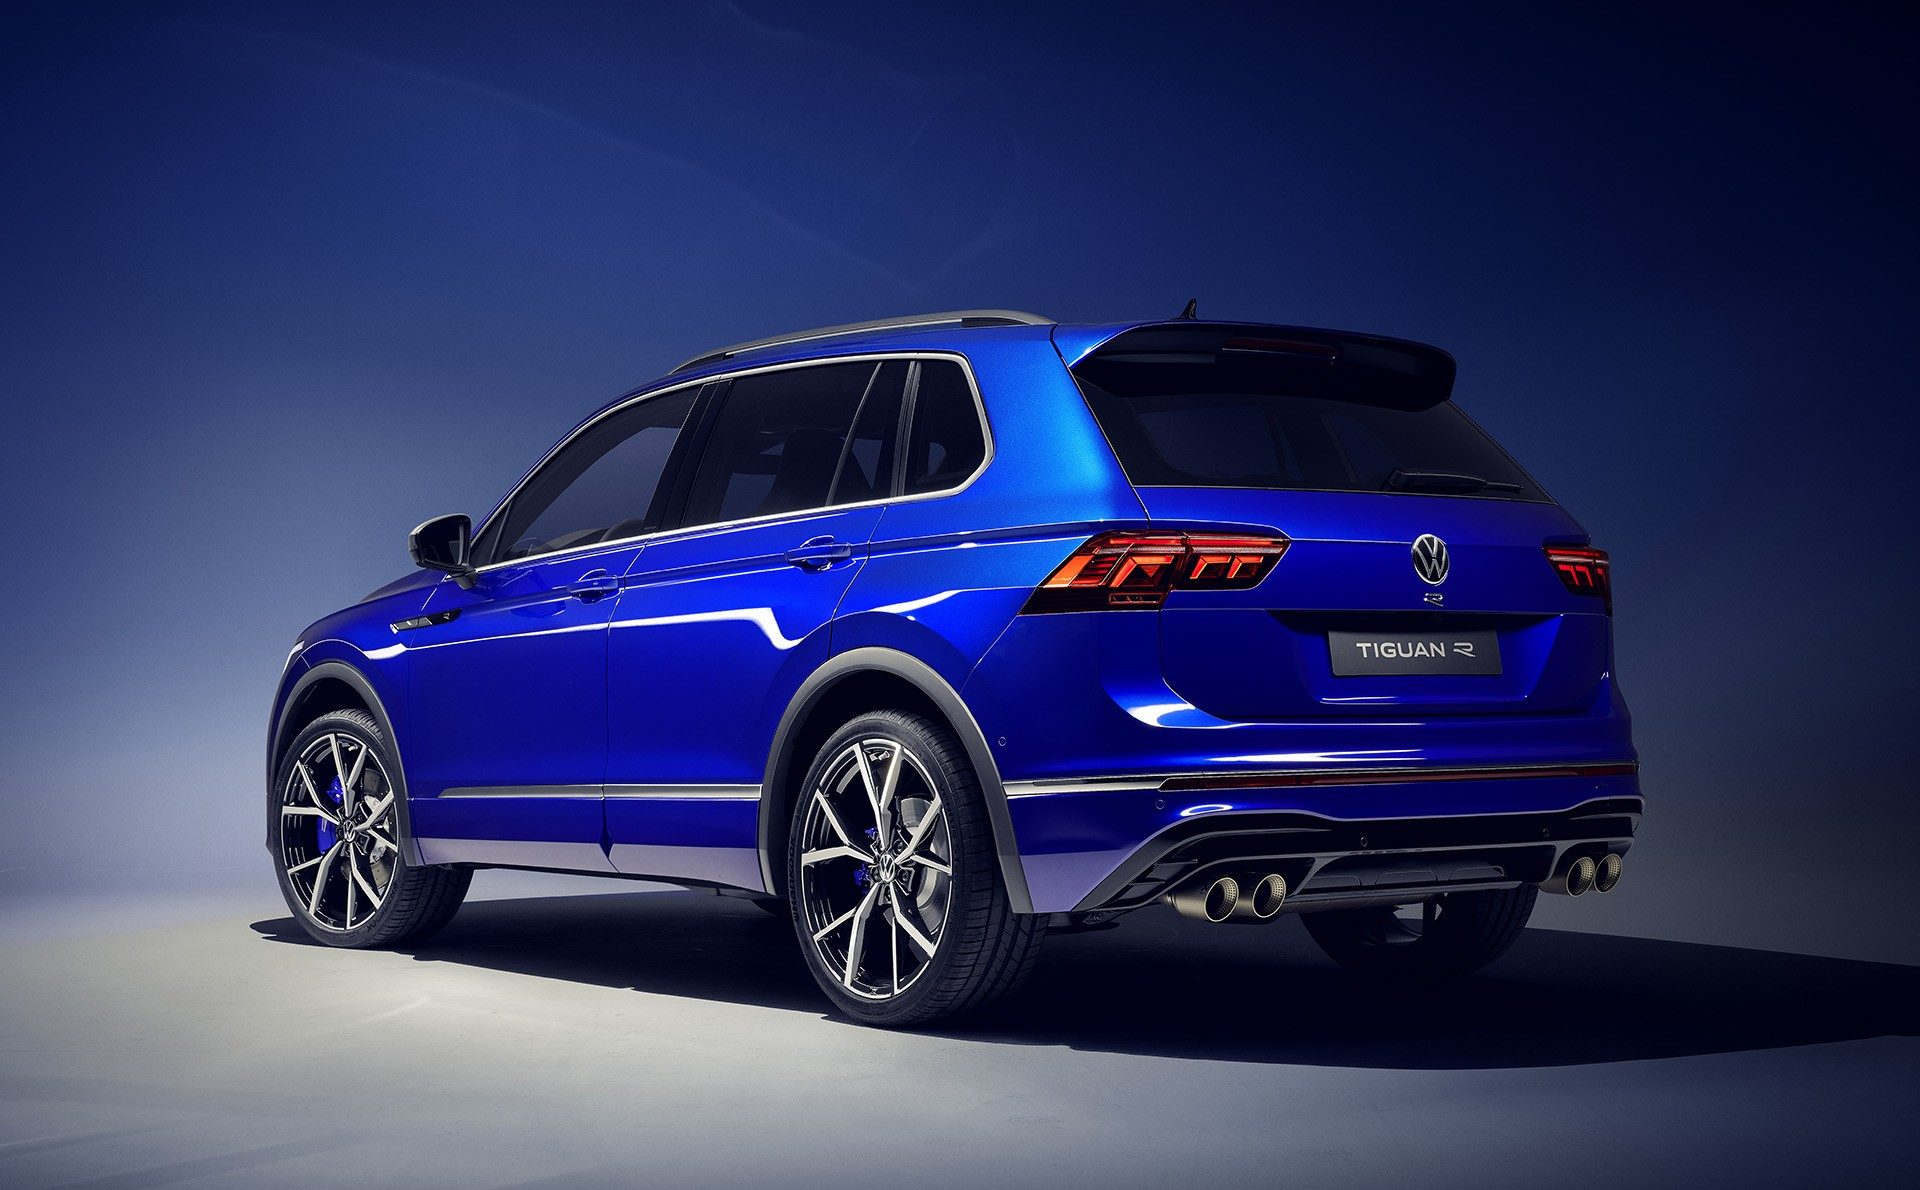 VW estreia Tiguan R com 320 cv | Auto Drive